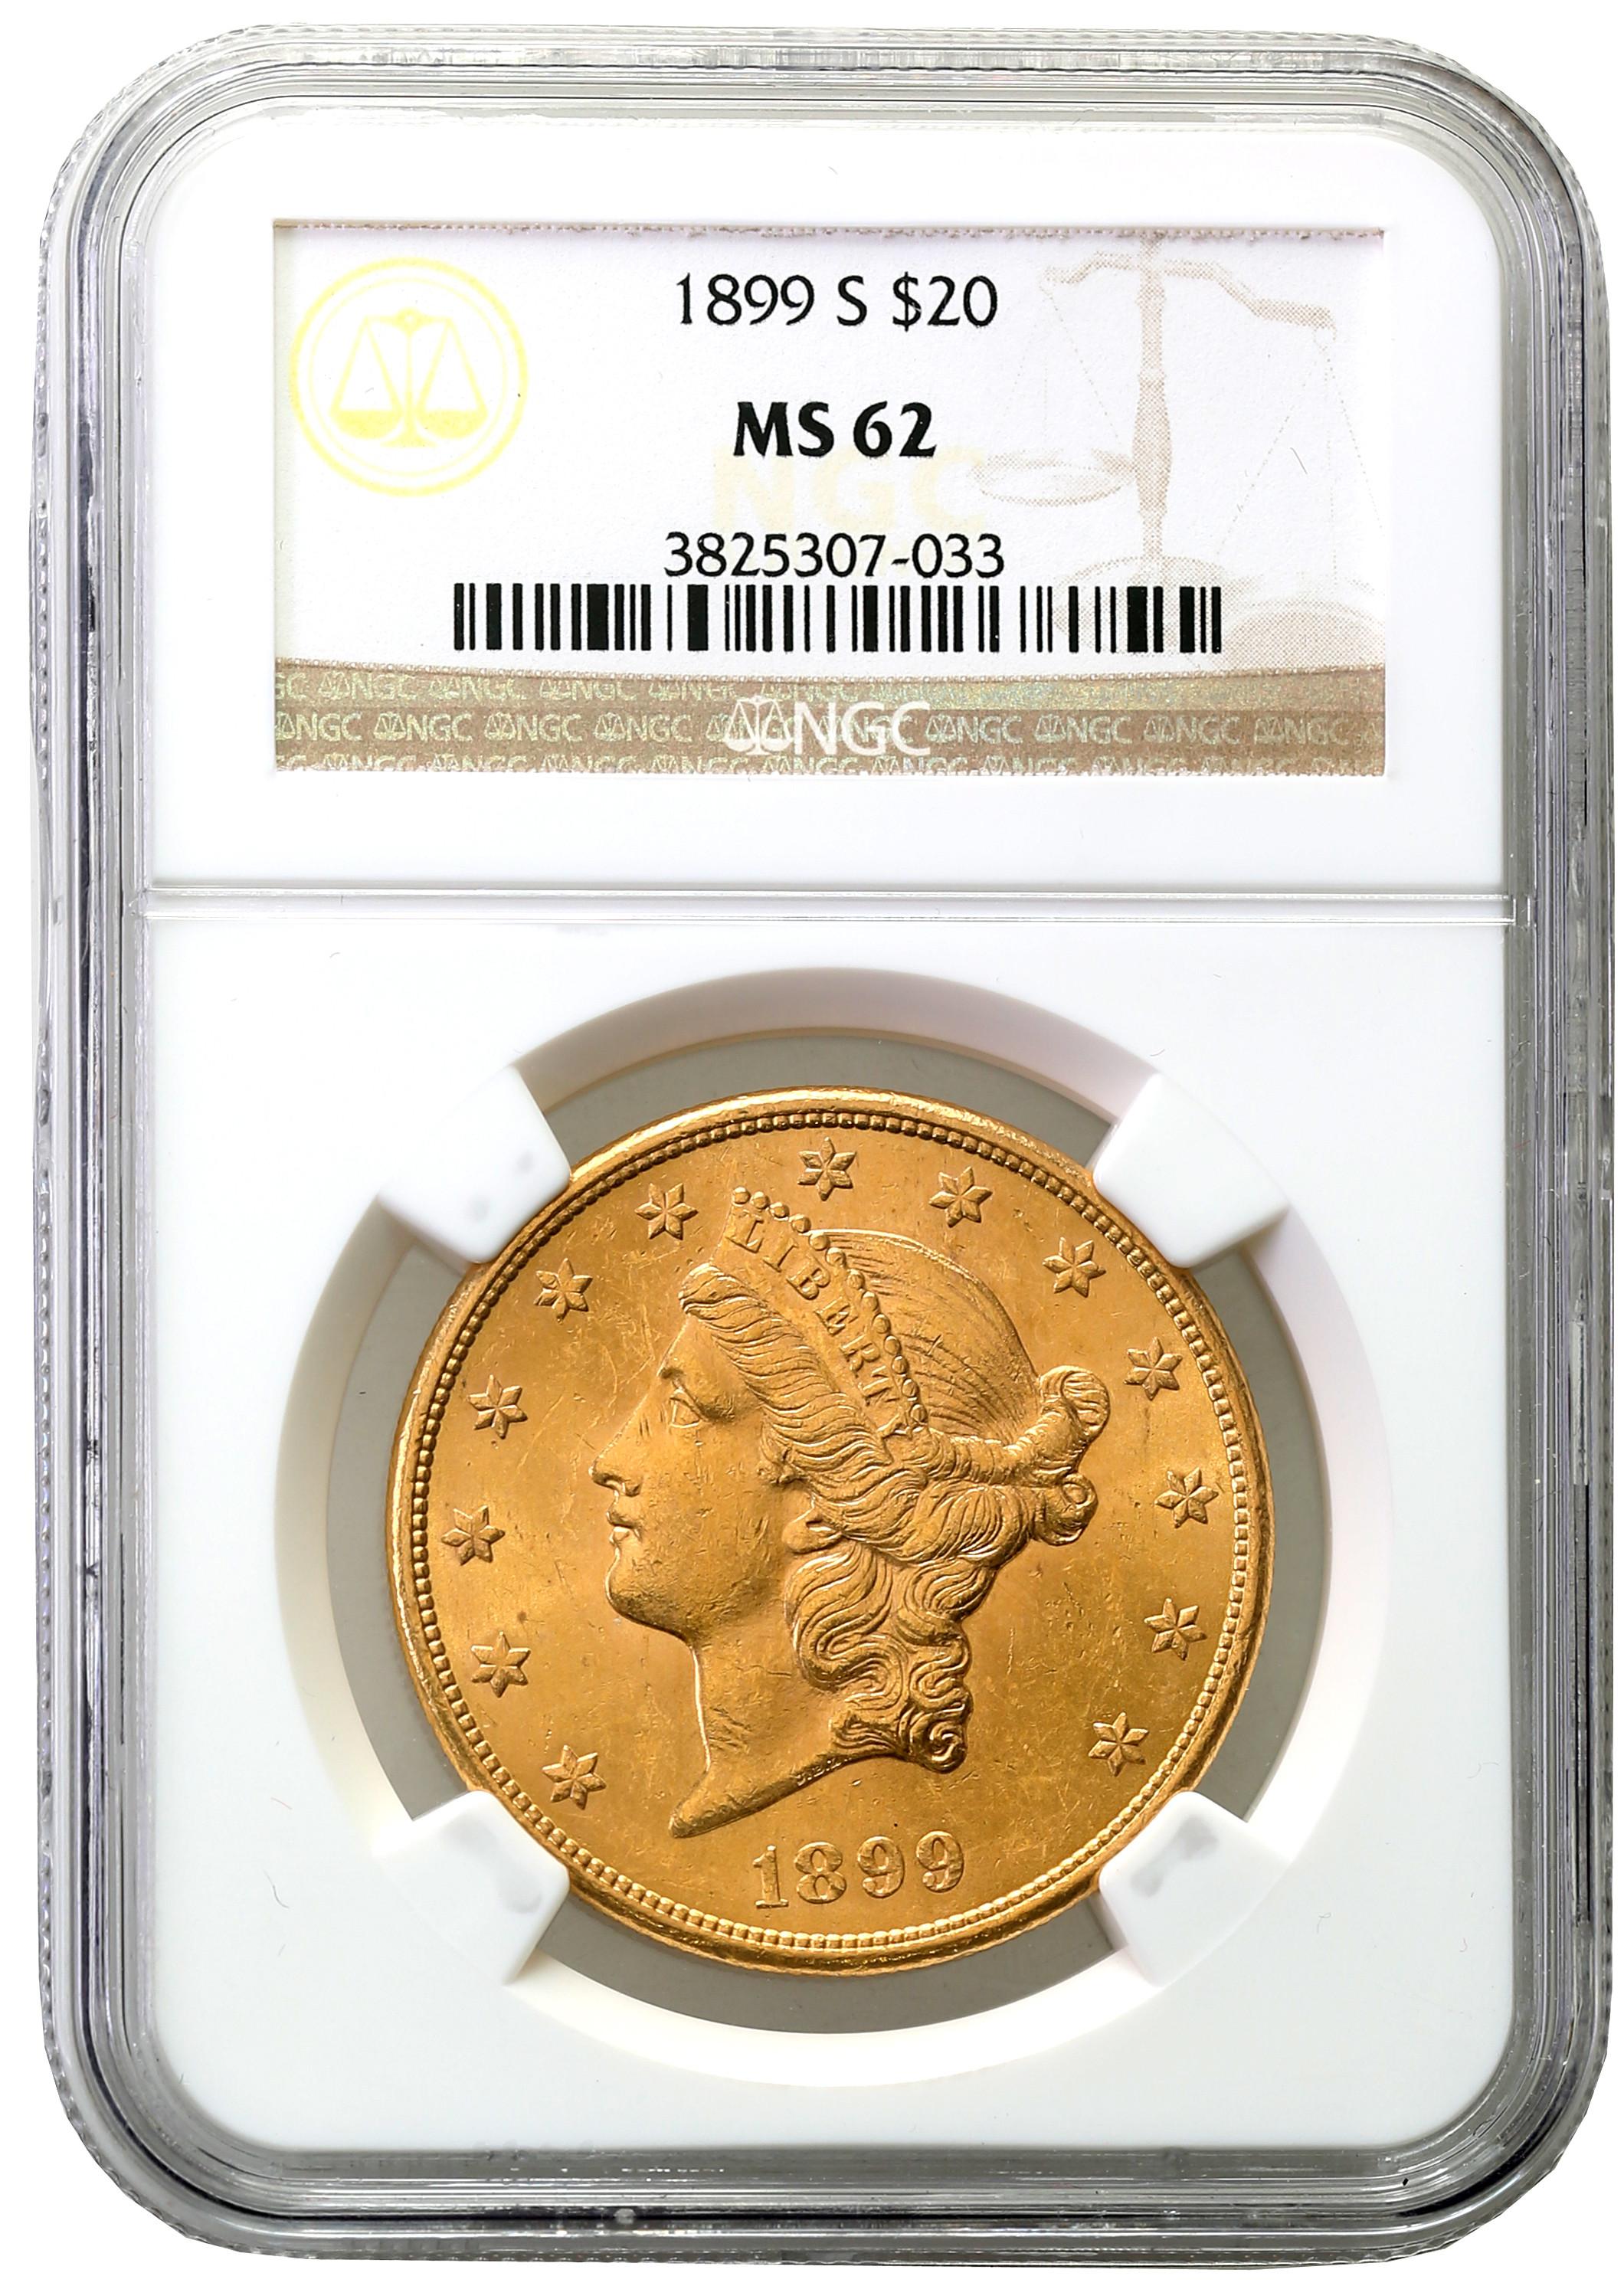 USA. 20 dolarów Liberty 1899 S - San Francisco NGC MS62